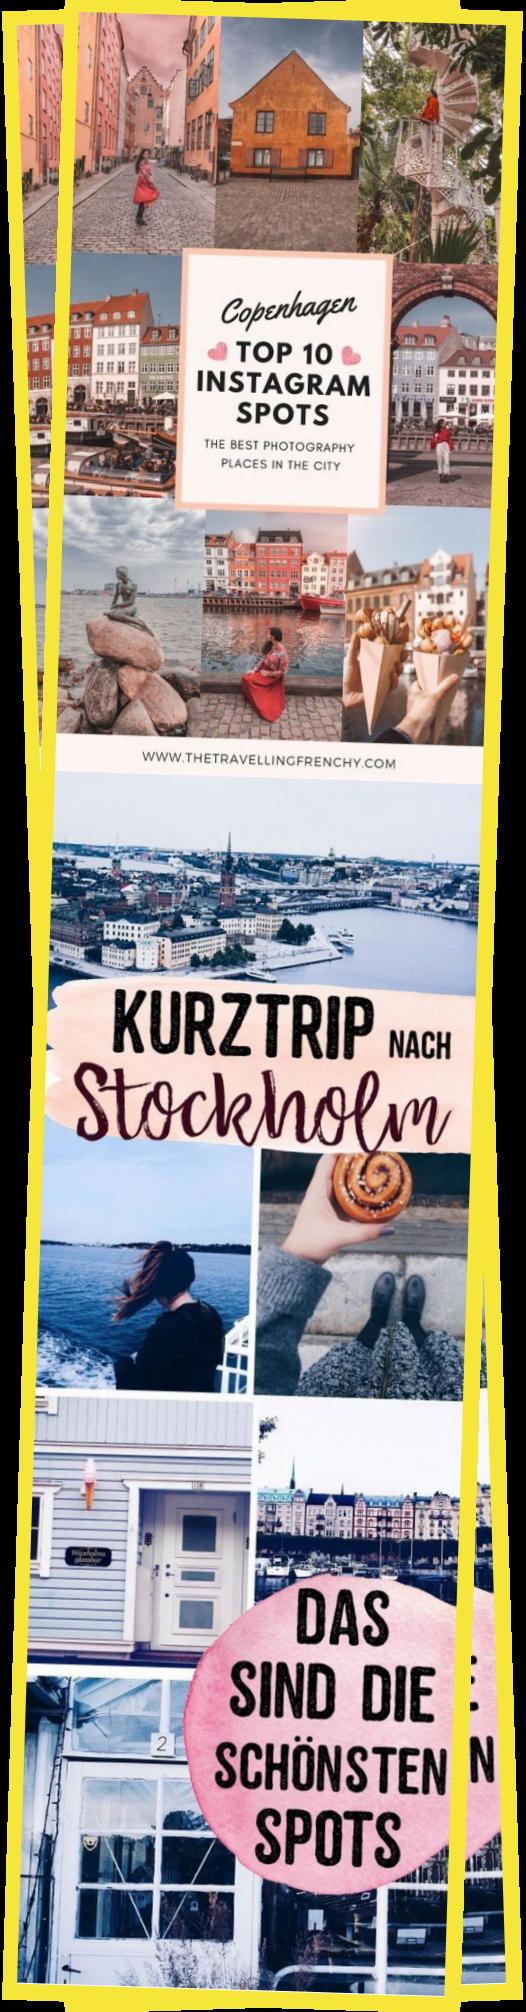 Top Instagram and Photography Spots in Copenhagen, Denmark #denmark #copenhagen  #Most #Instagrammable #Places #Copenhagen #Travelling #Frenchy #vacationtips #tumblrtravelpictures #familytraveldestinations #scandinaviatravel #travelcheap #italytravel #travelideas #irelandtravelideas #sweedenideas